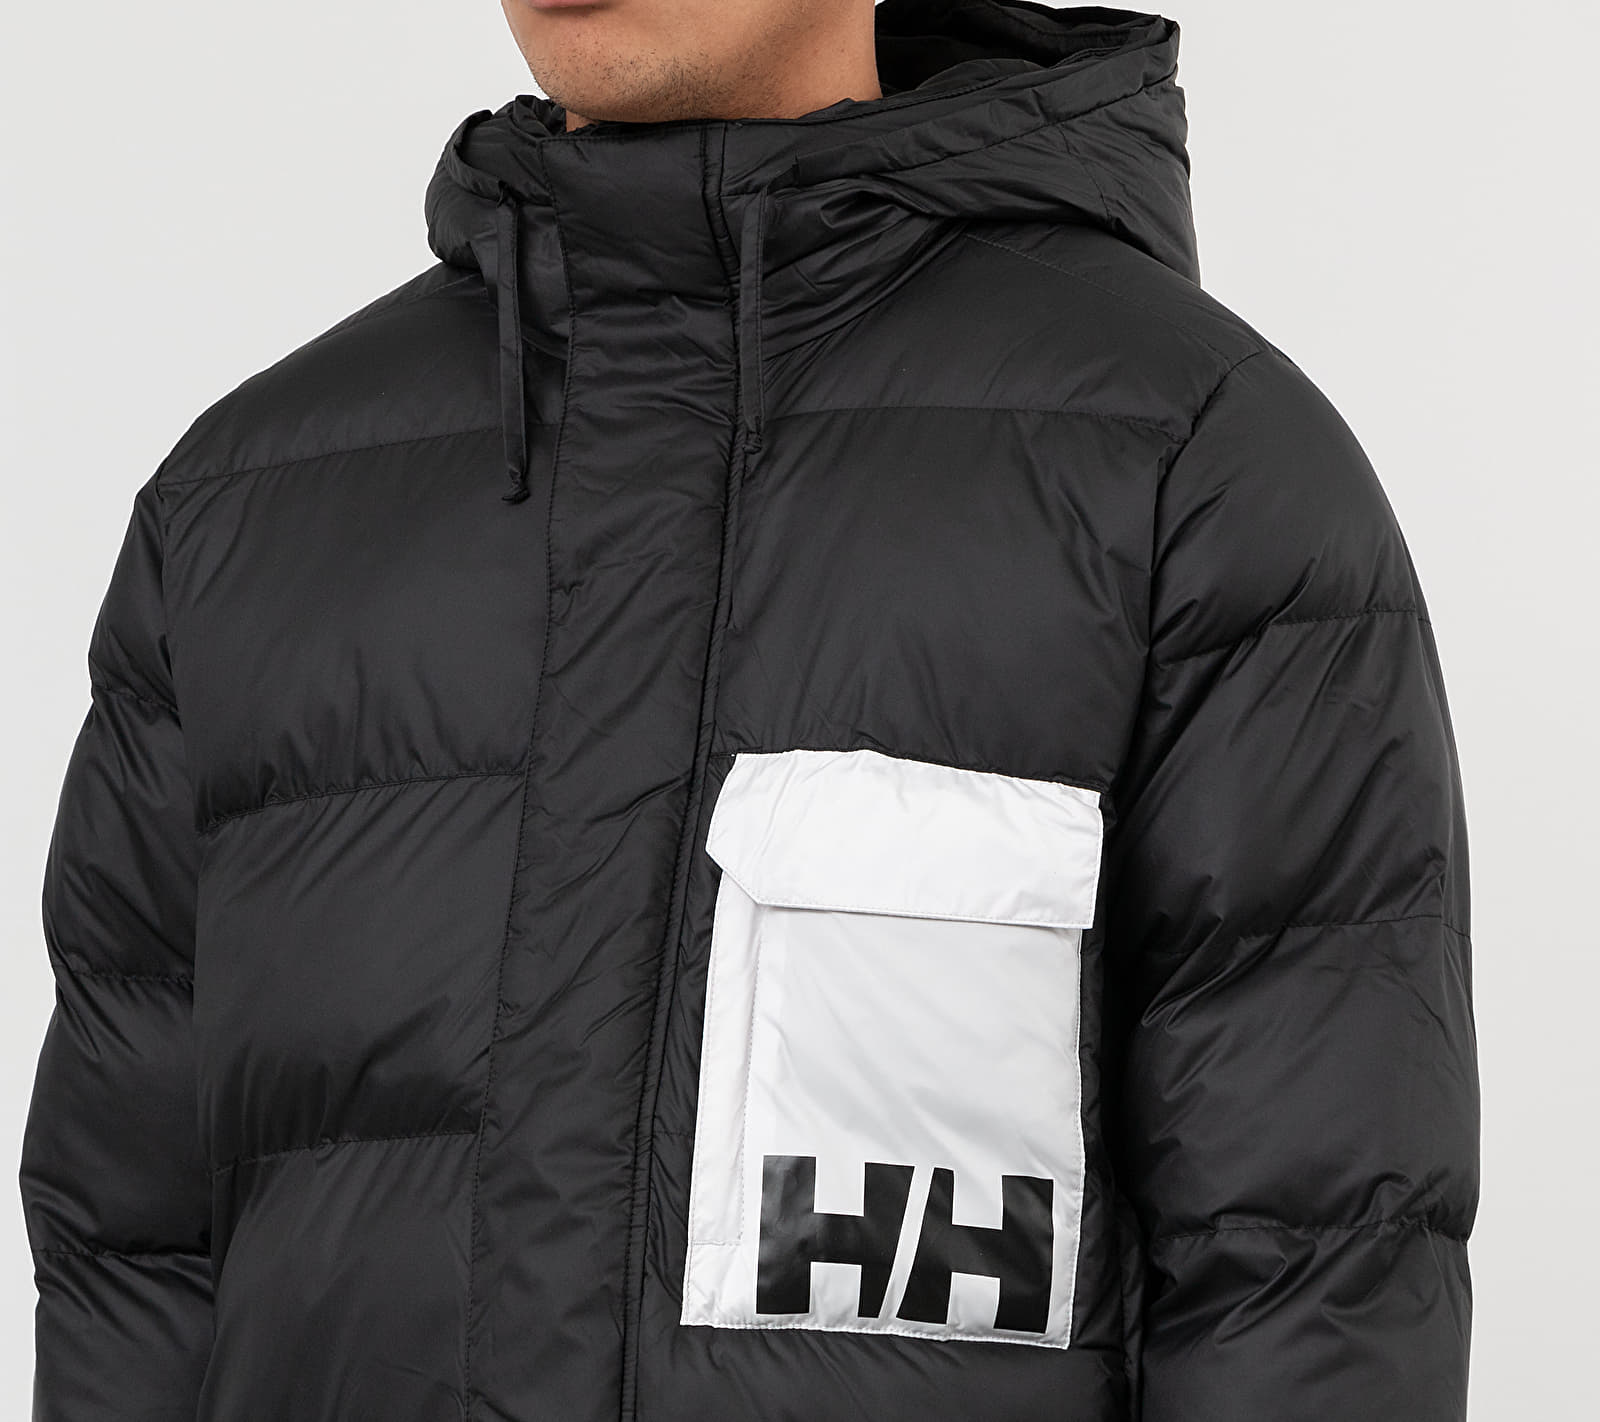 Helly Hansen p&c Puffer Jacket Black L, Black, 53327 990 | eBay